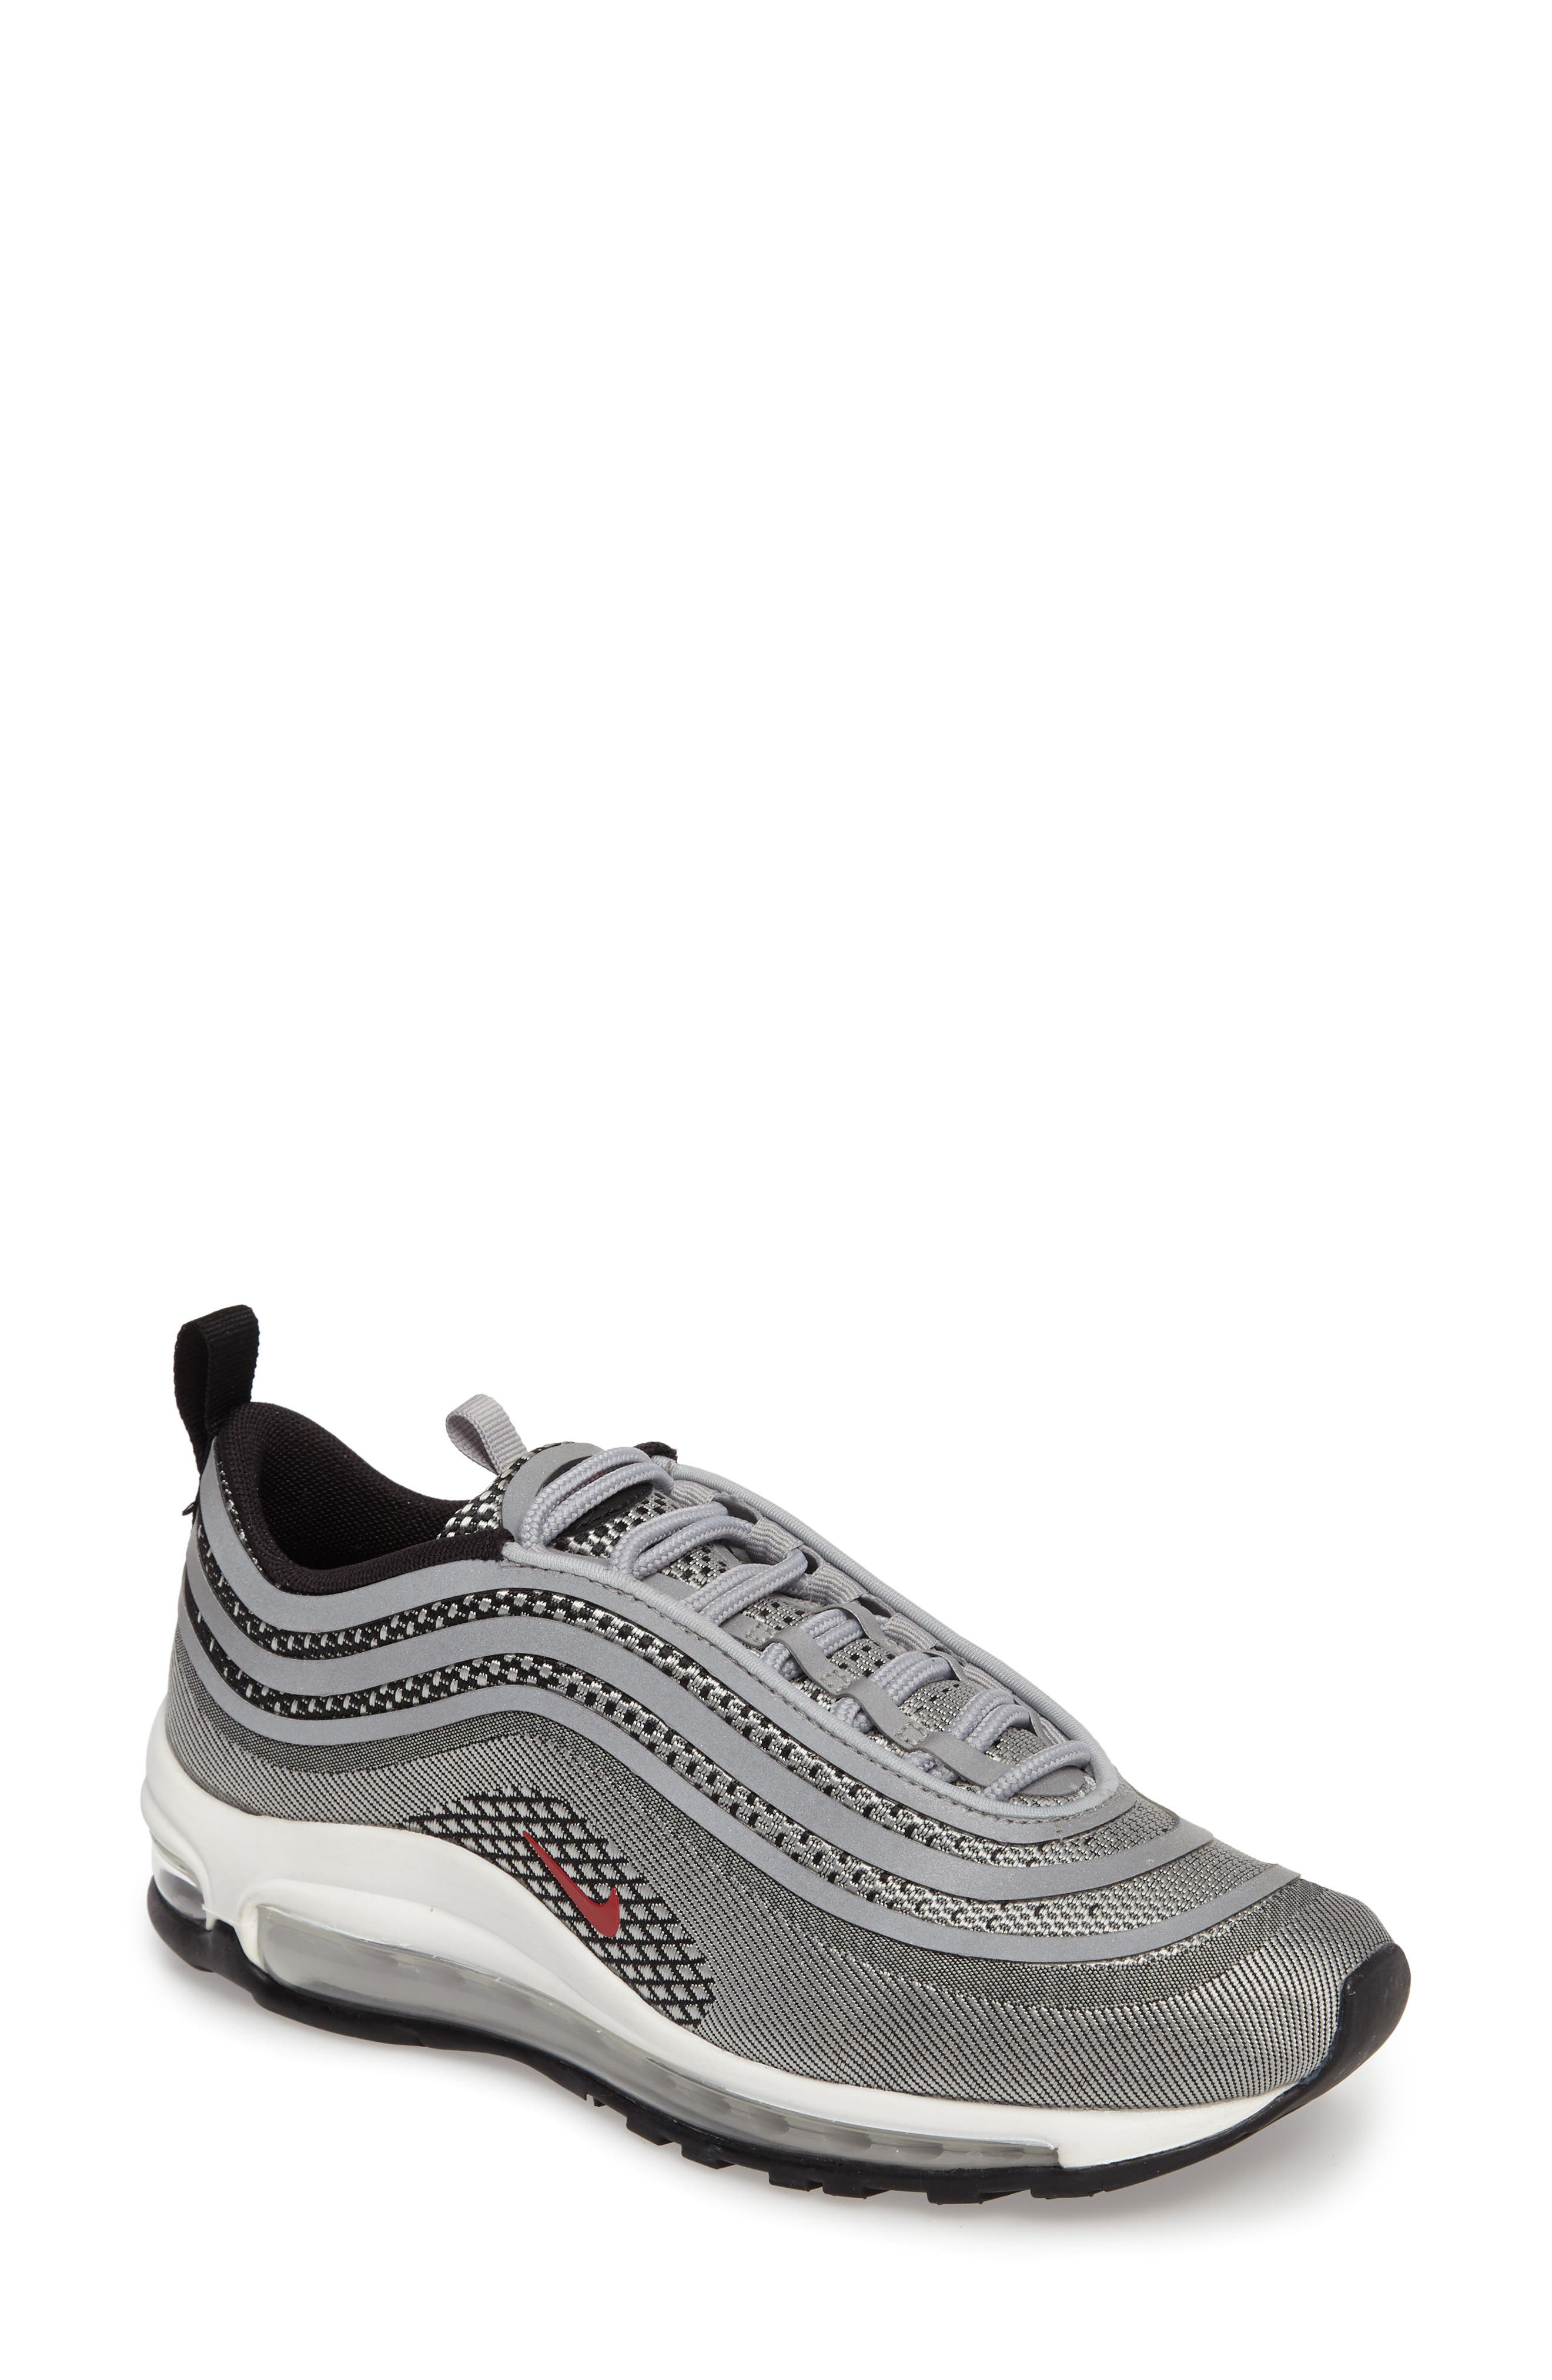 Air Max 97 Ultralight 2017 Sneaker,                         Main,                         color, Metallic Silver/ Varsity Red